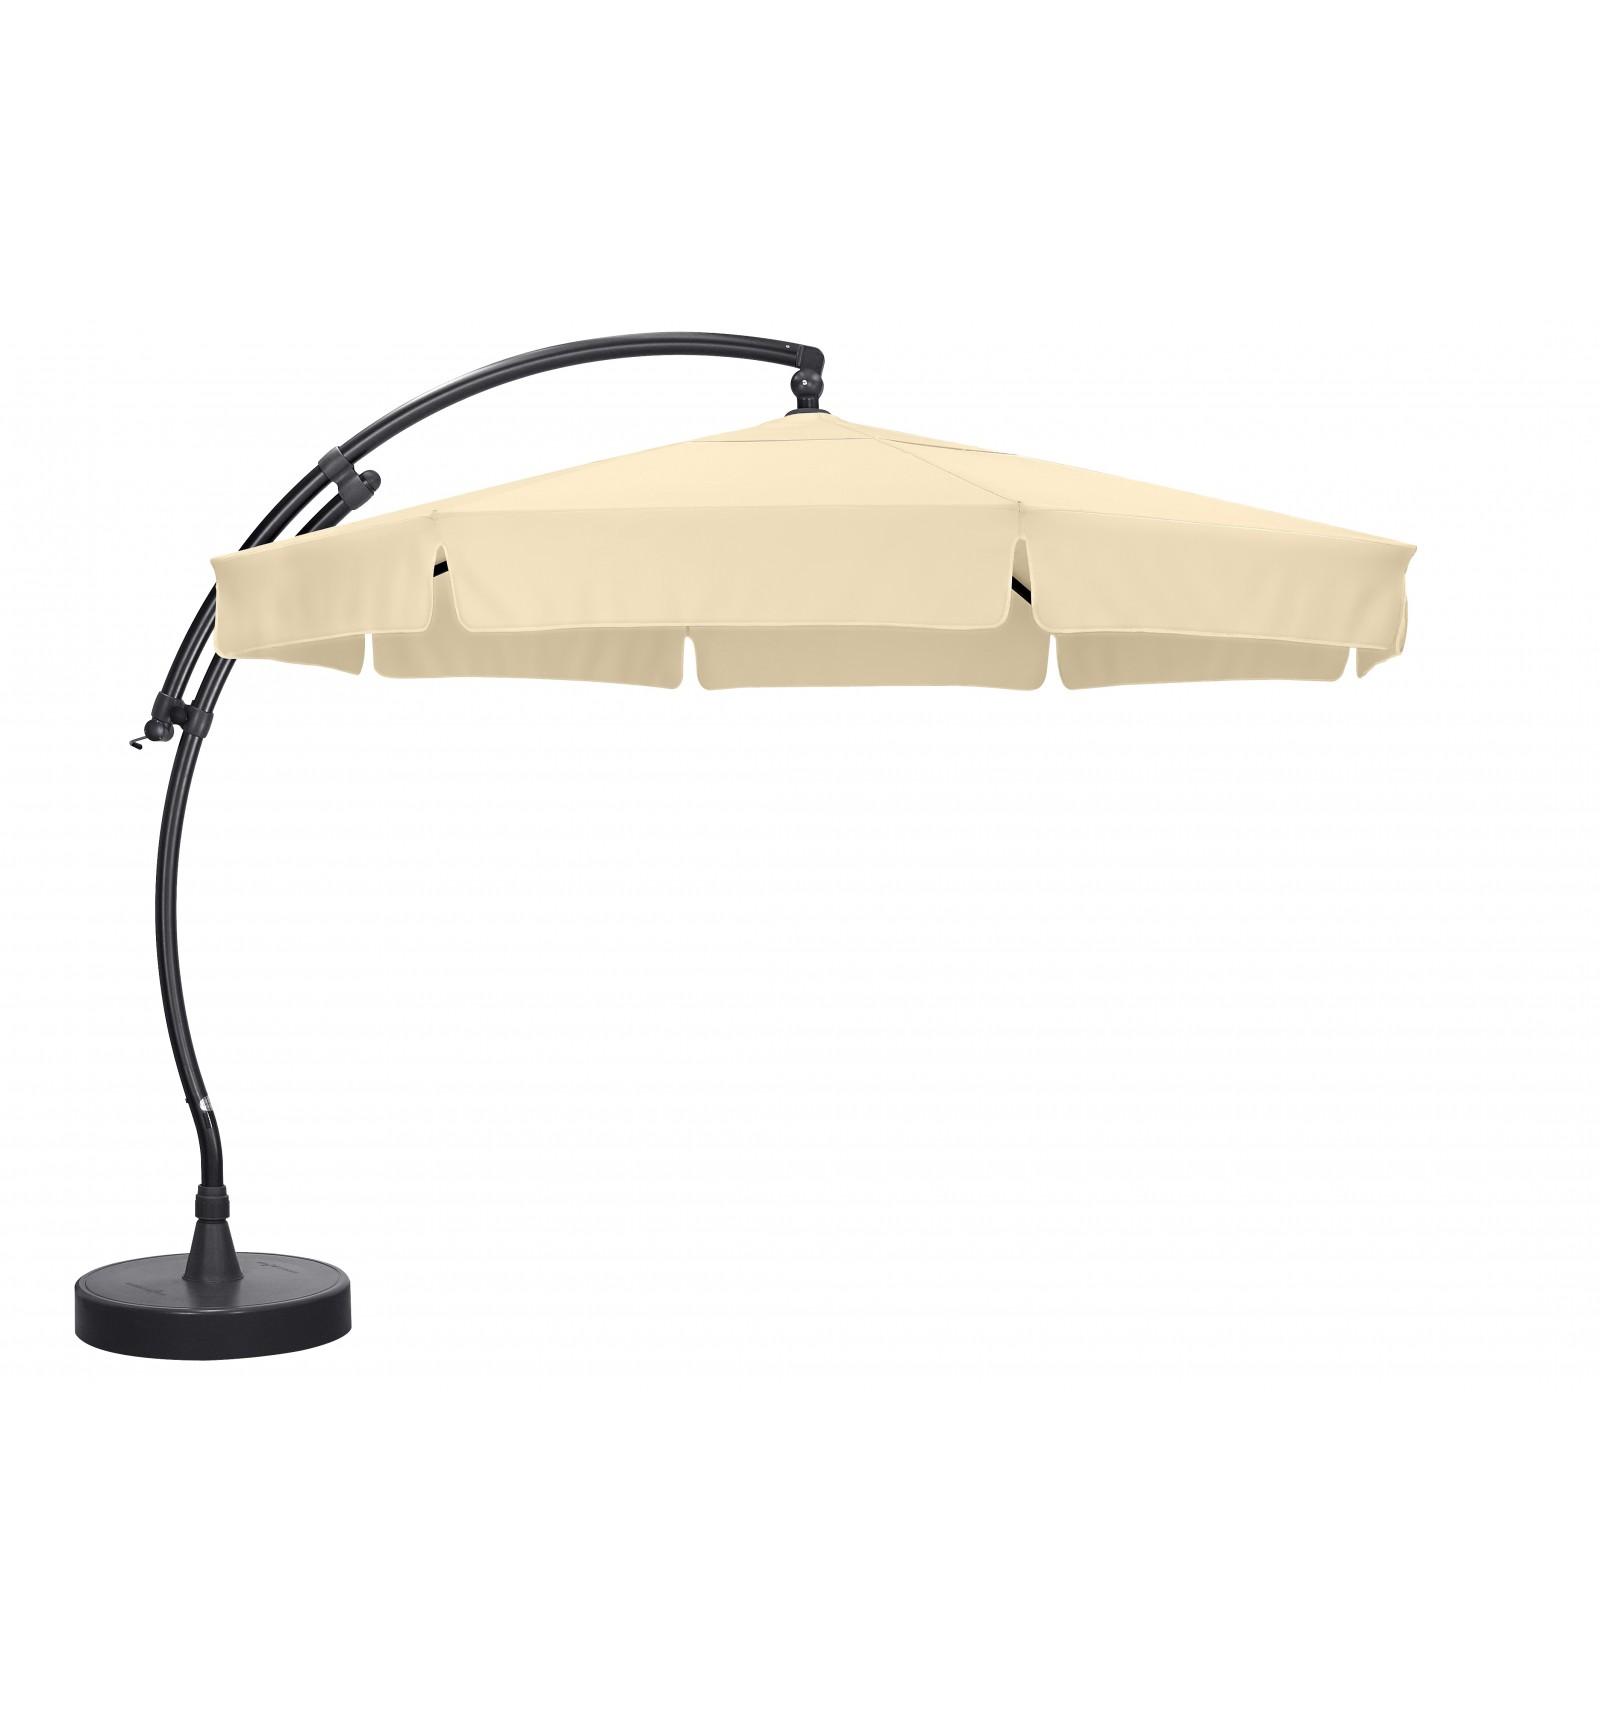 easy sun parasol halve parasol. Black Bedroom Furniture Sets. Home Design Ideas